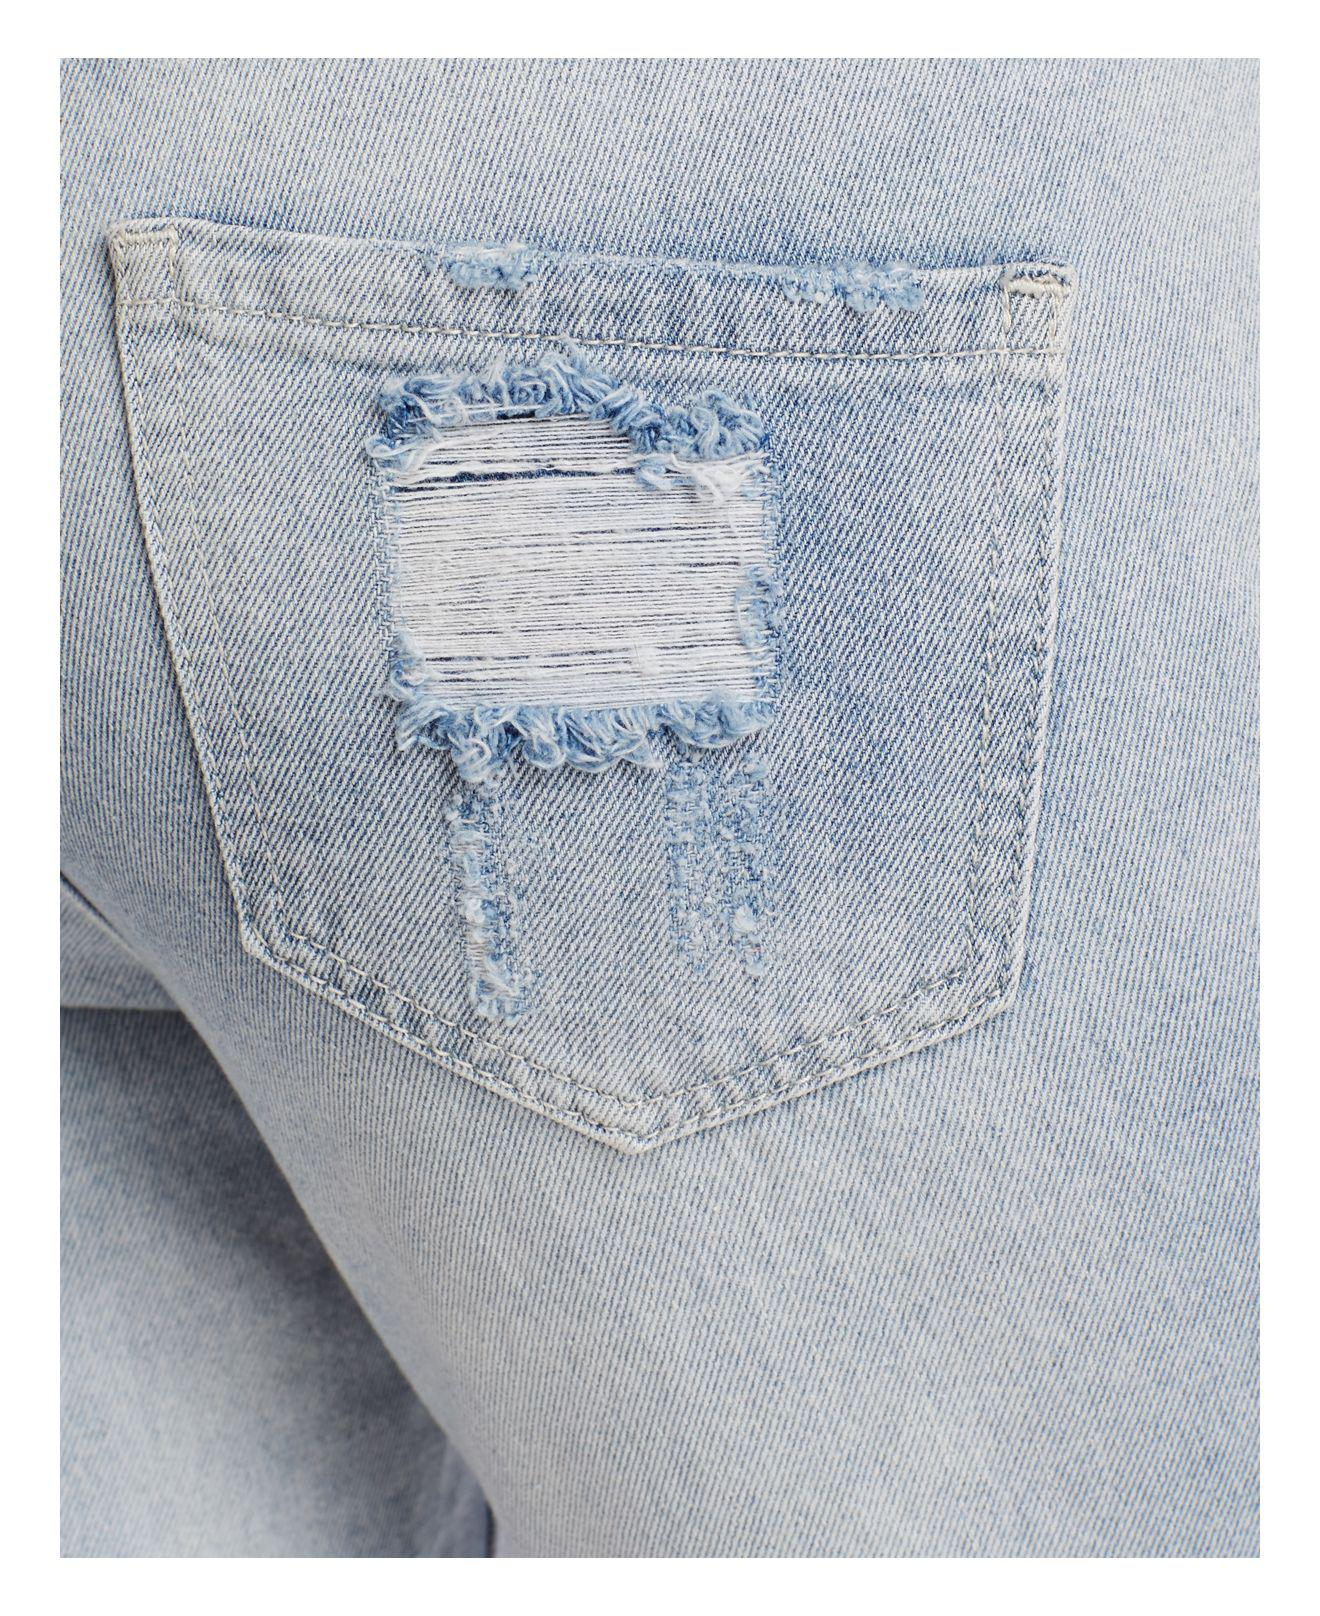 True Religion Denim Embellished Audrey Slim Boyfriend Jeans In New City in Blue